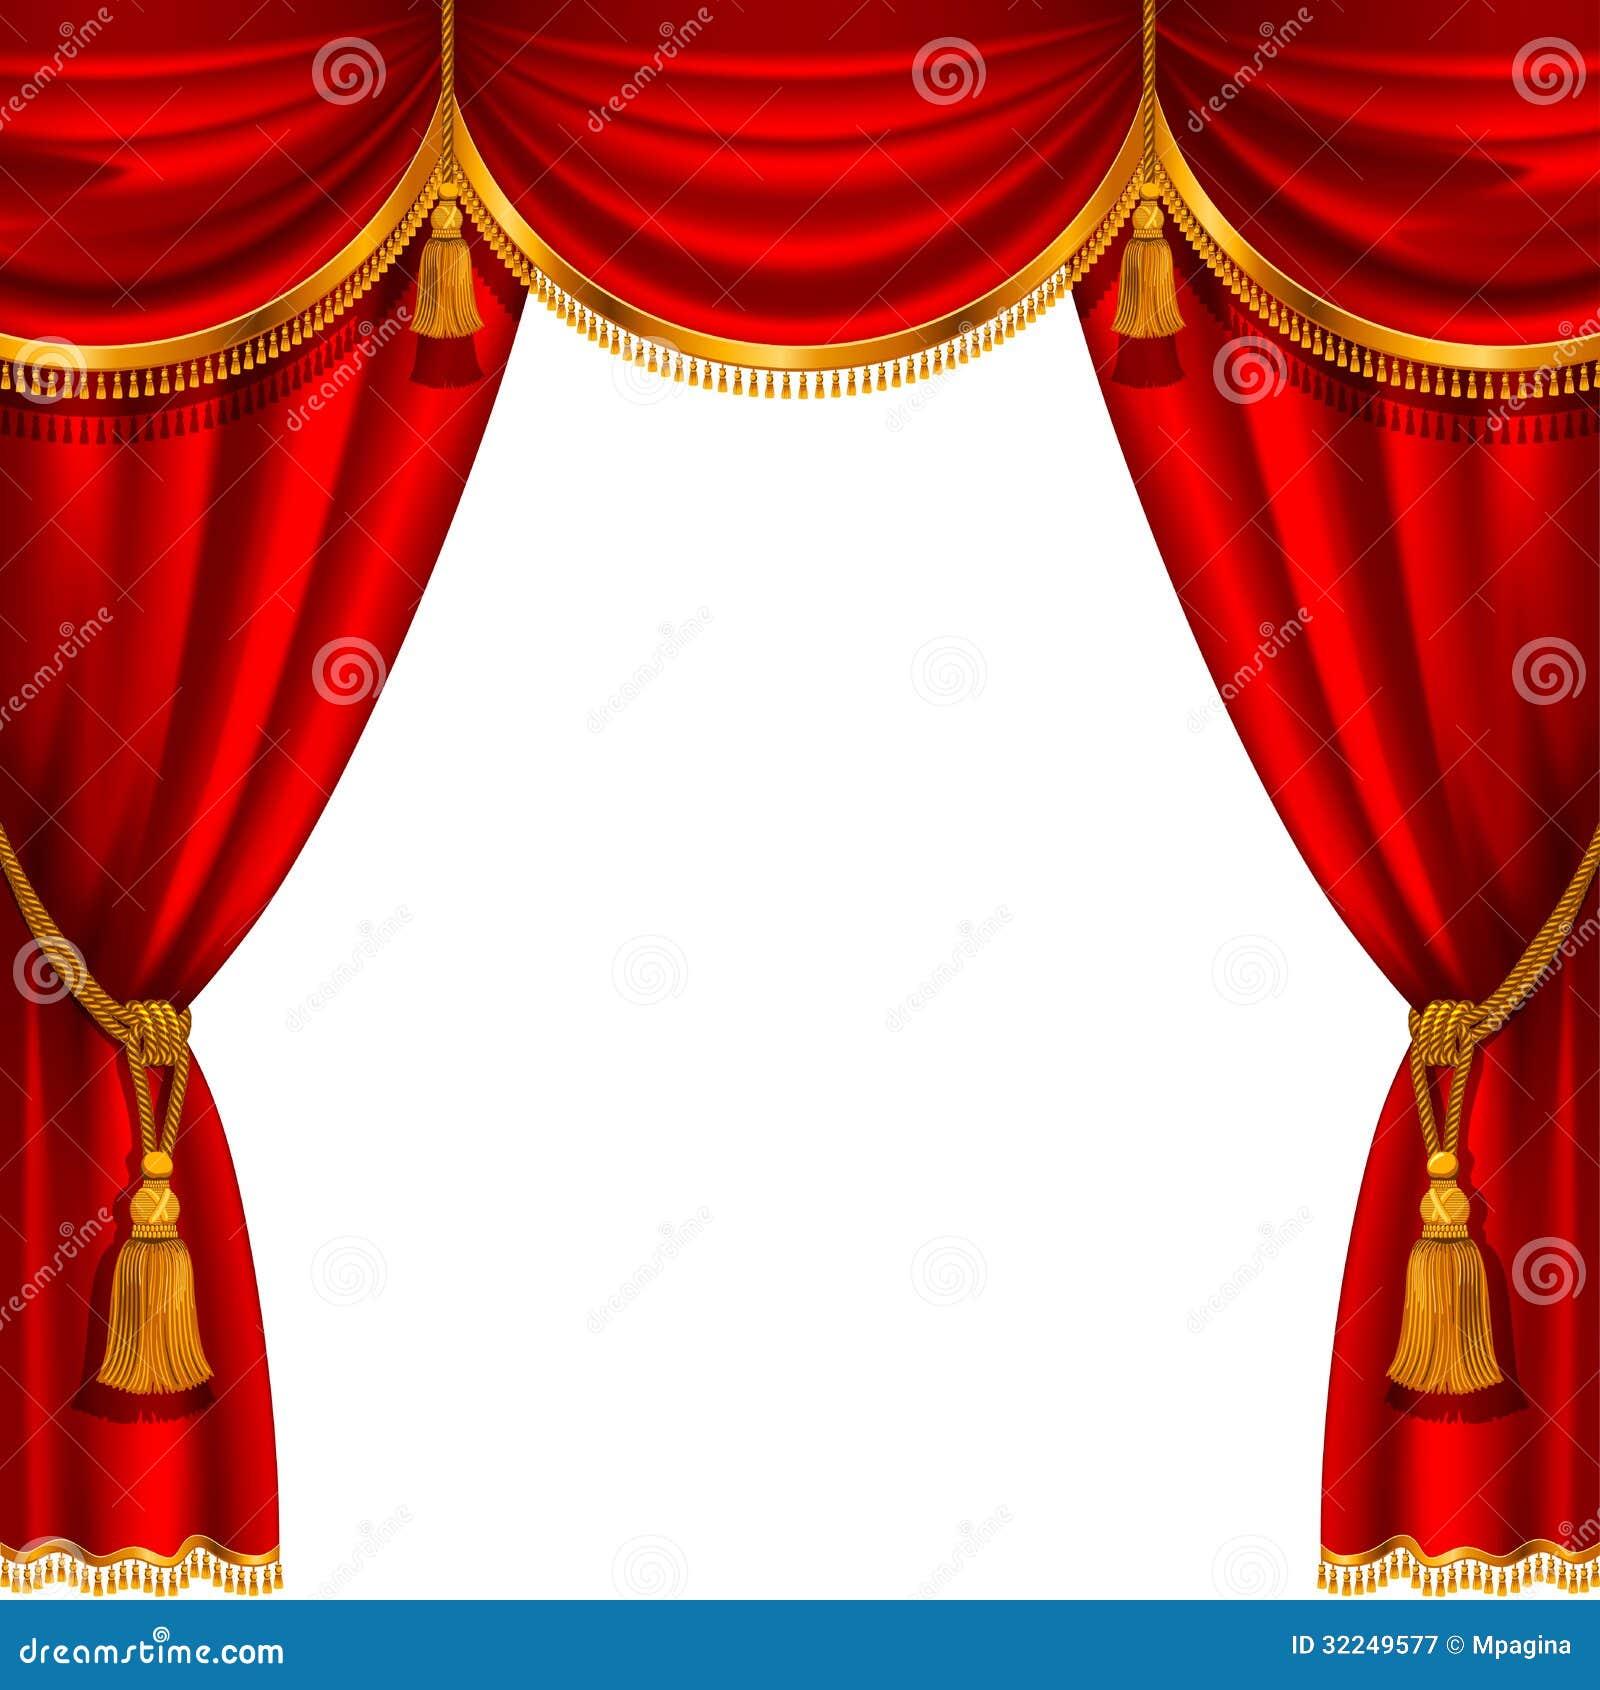 roter vorhang lizenzfreie stockfotografie bild 32249577. Black Bedroom Furniture Sets. Home Design Ideas